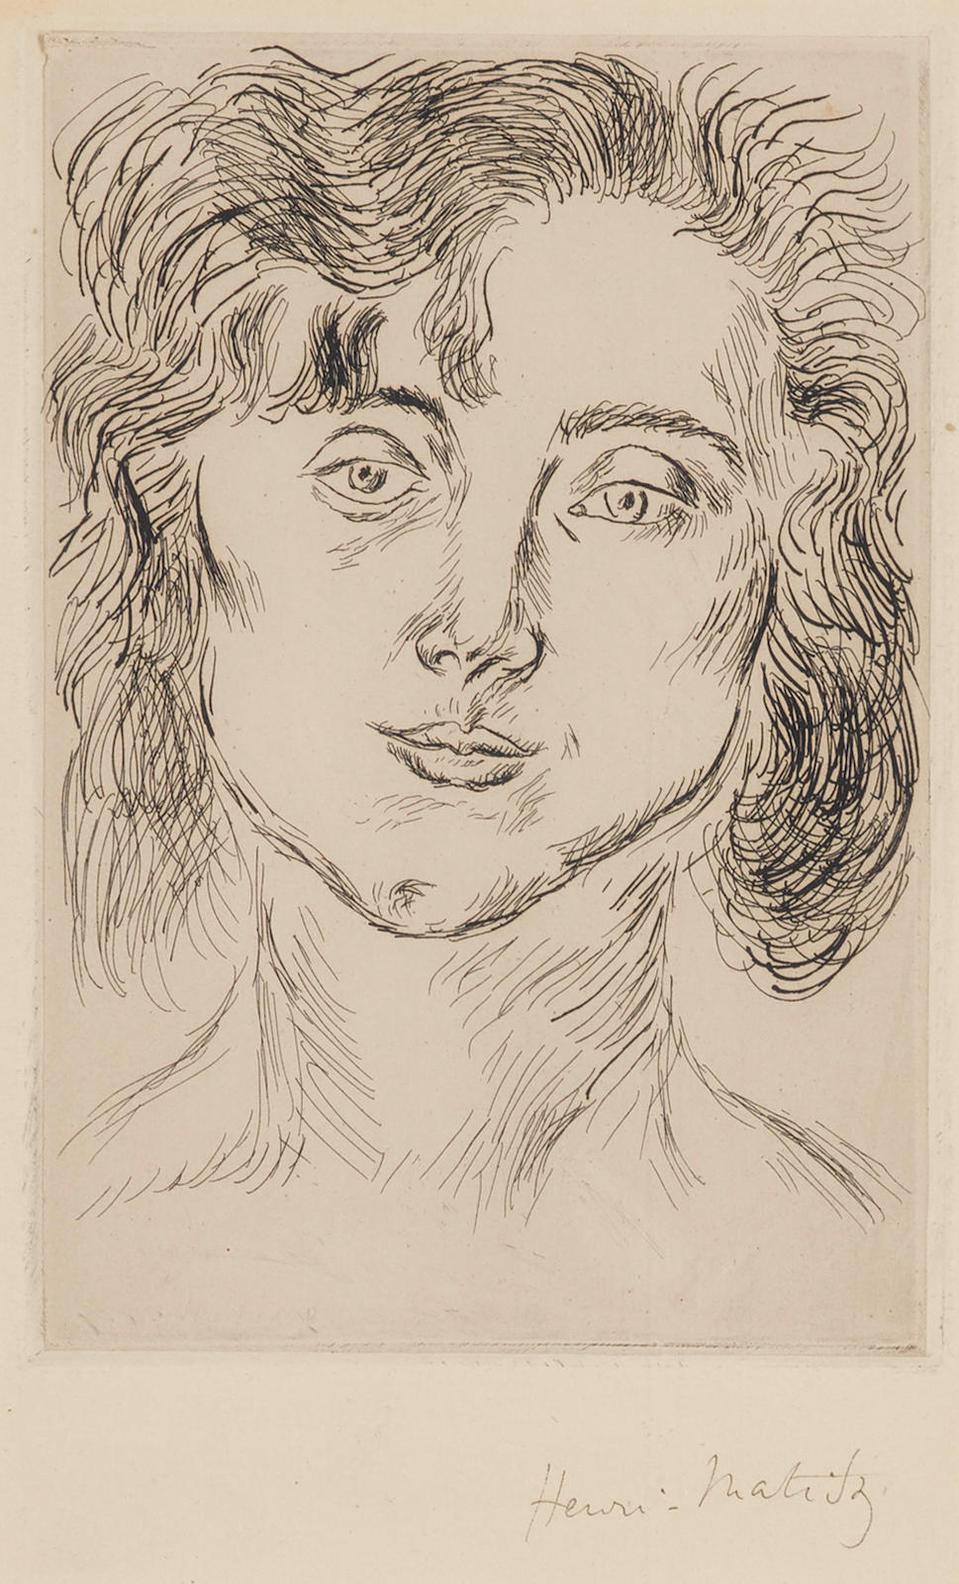 Henri Matisse-Mlle. M. M., From Cinquante Dessins (D. Bk. 2)-1920